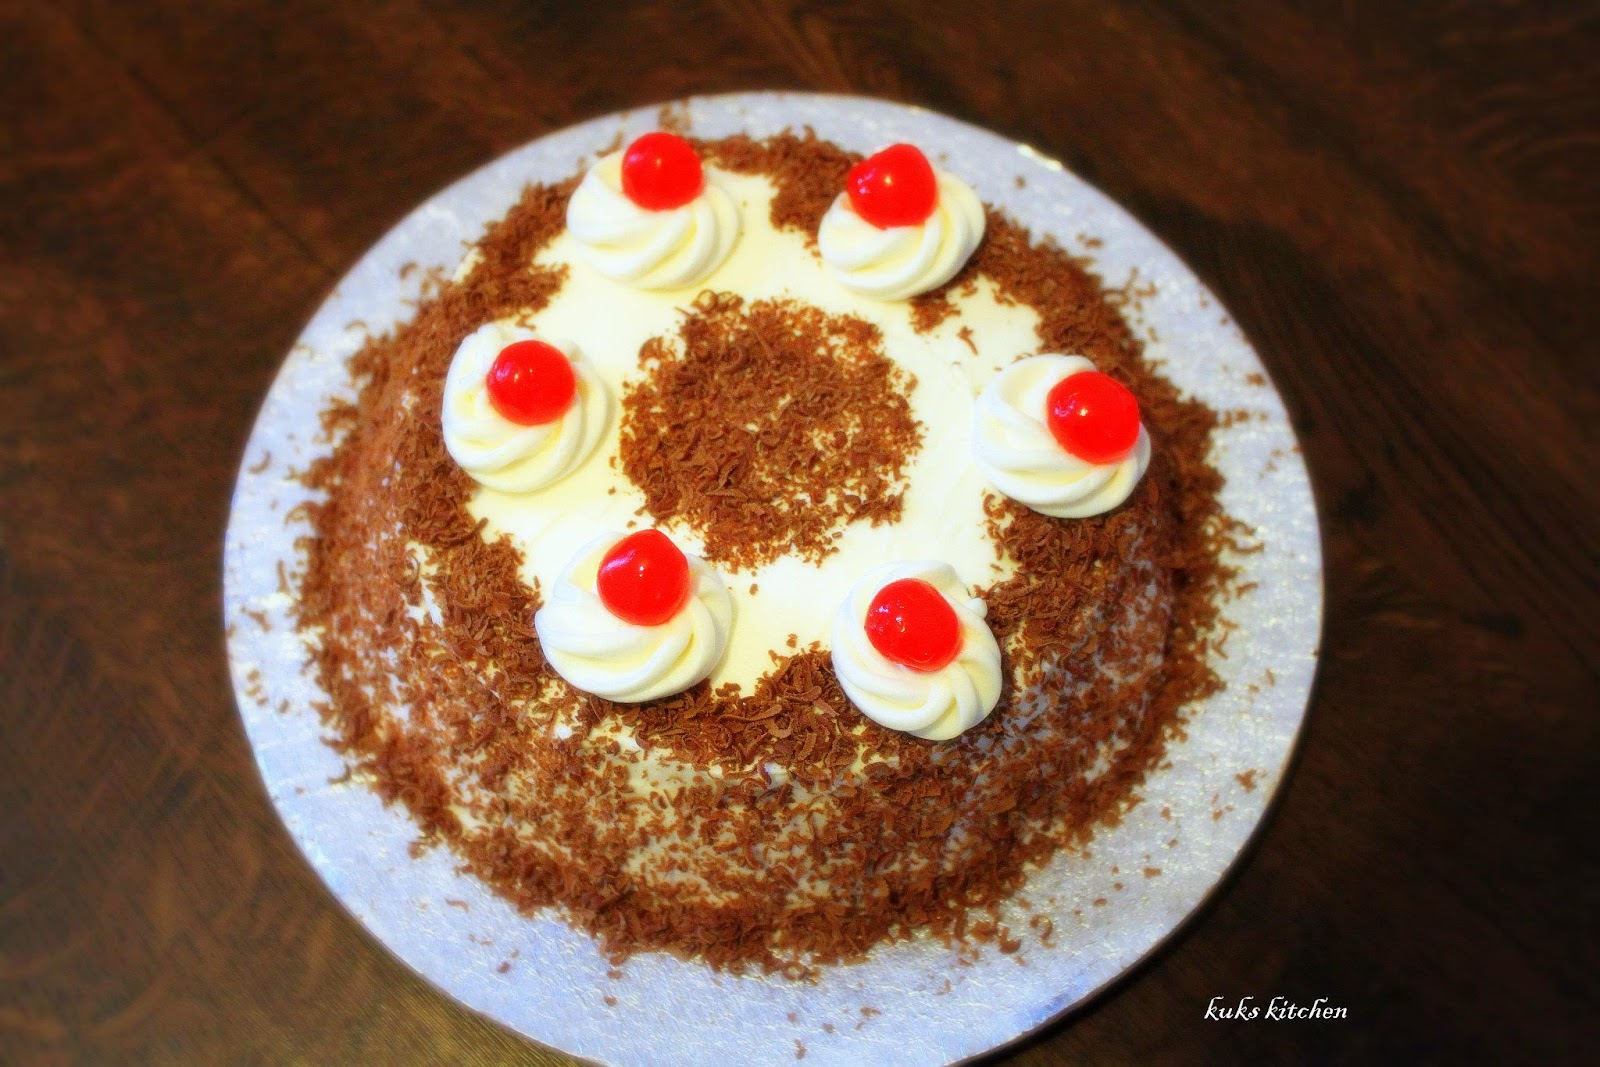 Cake Recipes In Malayalam Video: Kuk's Kitchen: Easy Kerala Malayali Syrian Christian